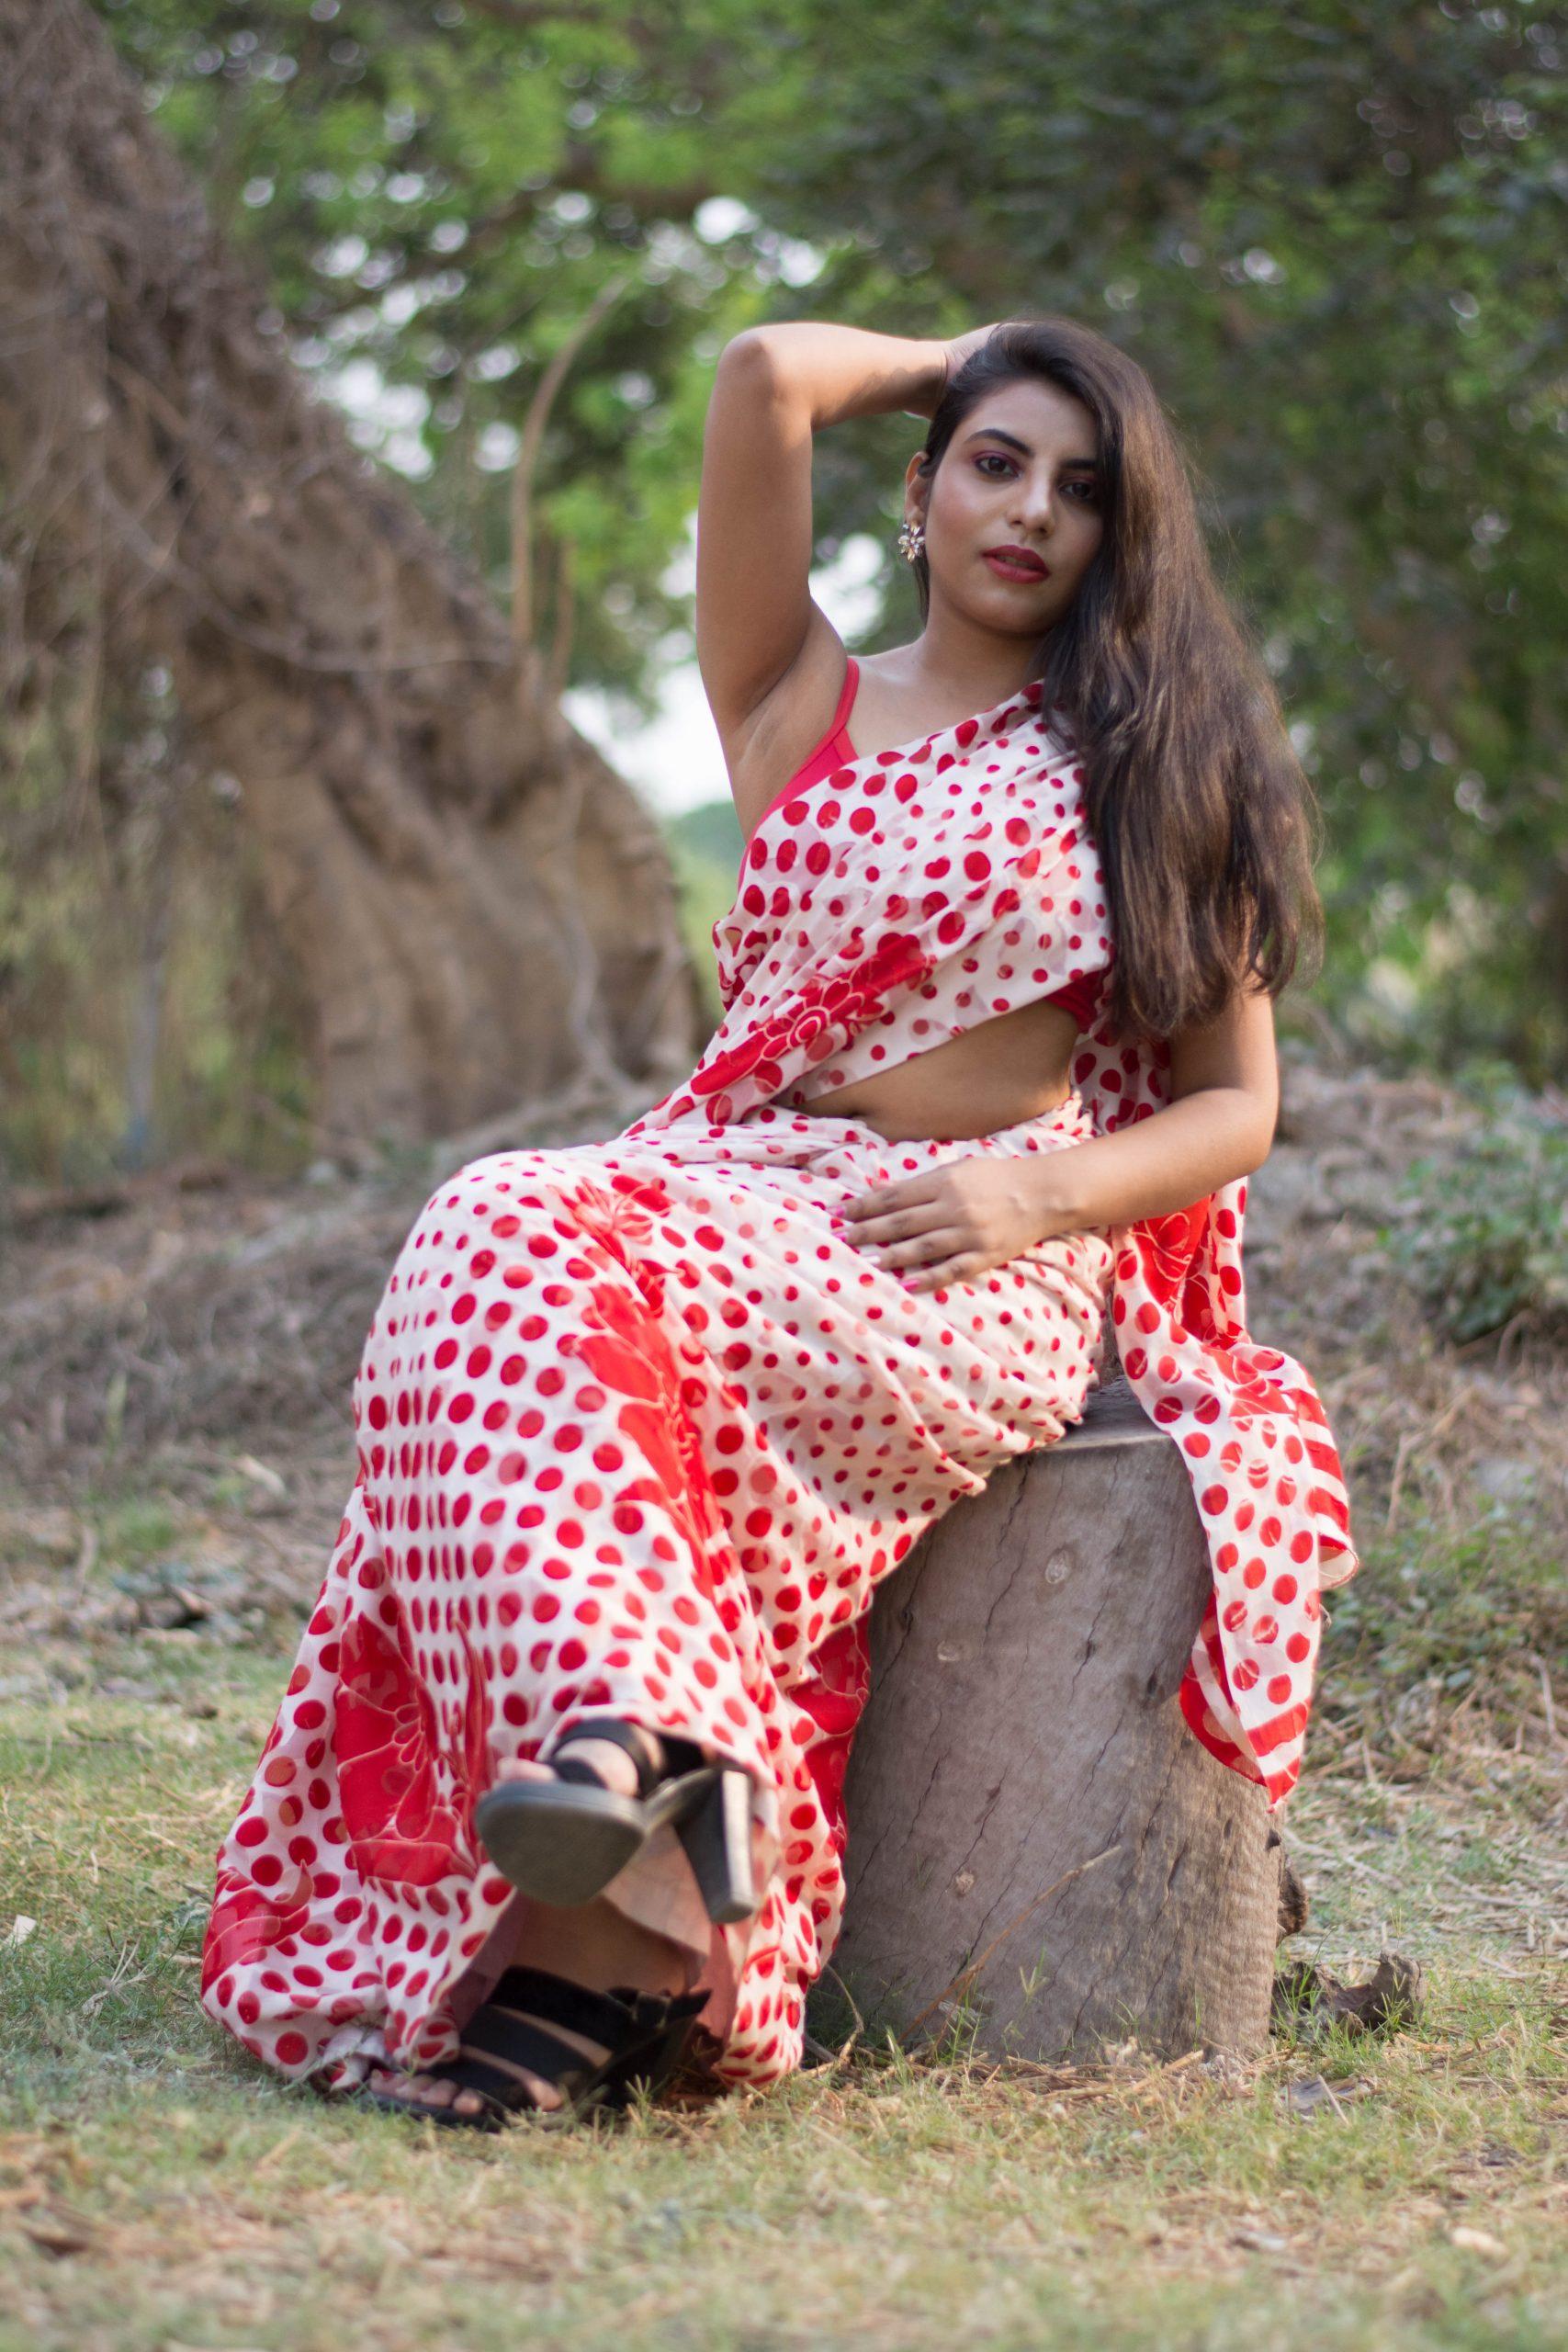 A woman sitting on a tree stump